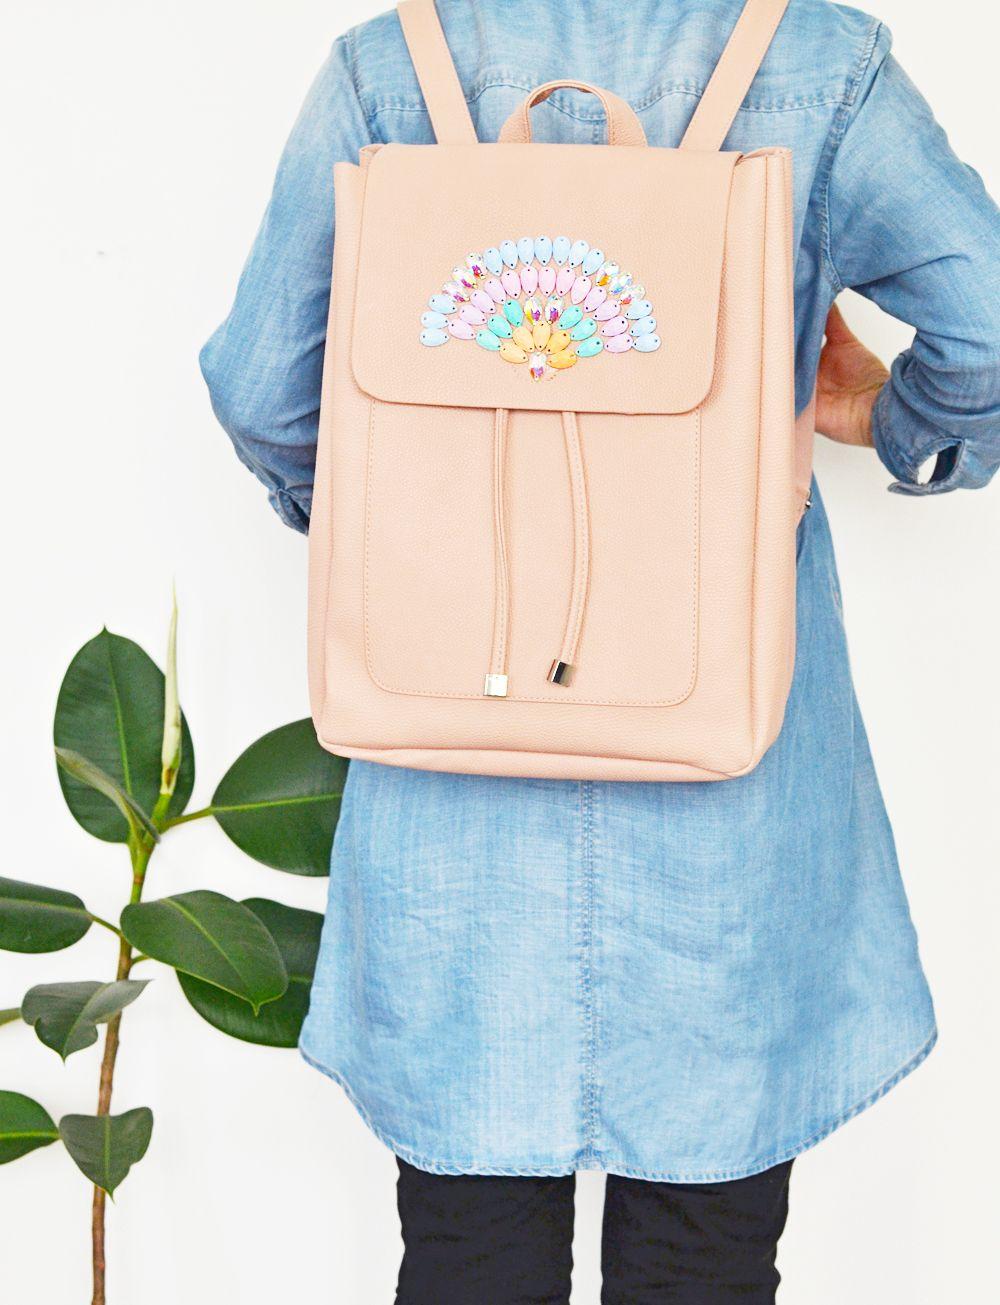 Diy pastel gemstone backpack project